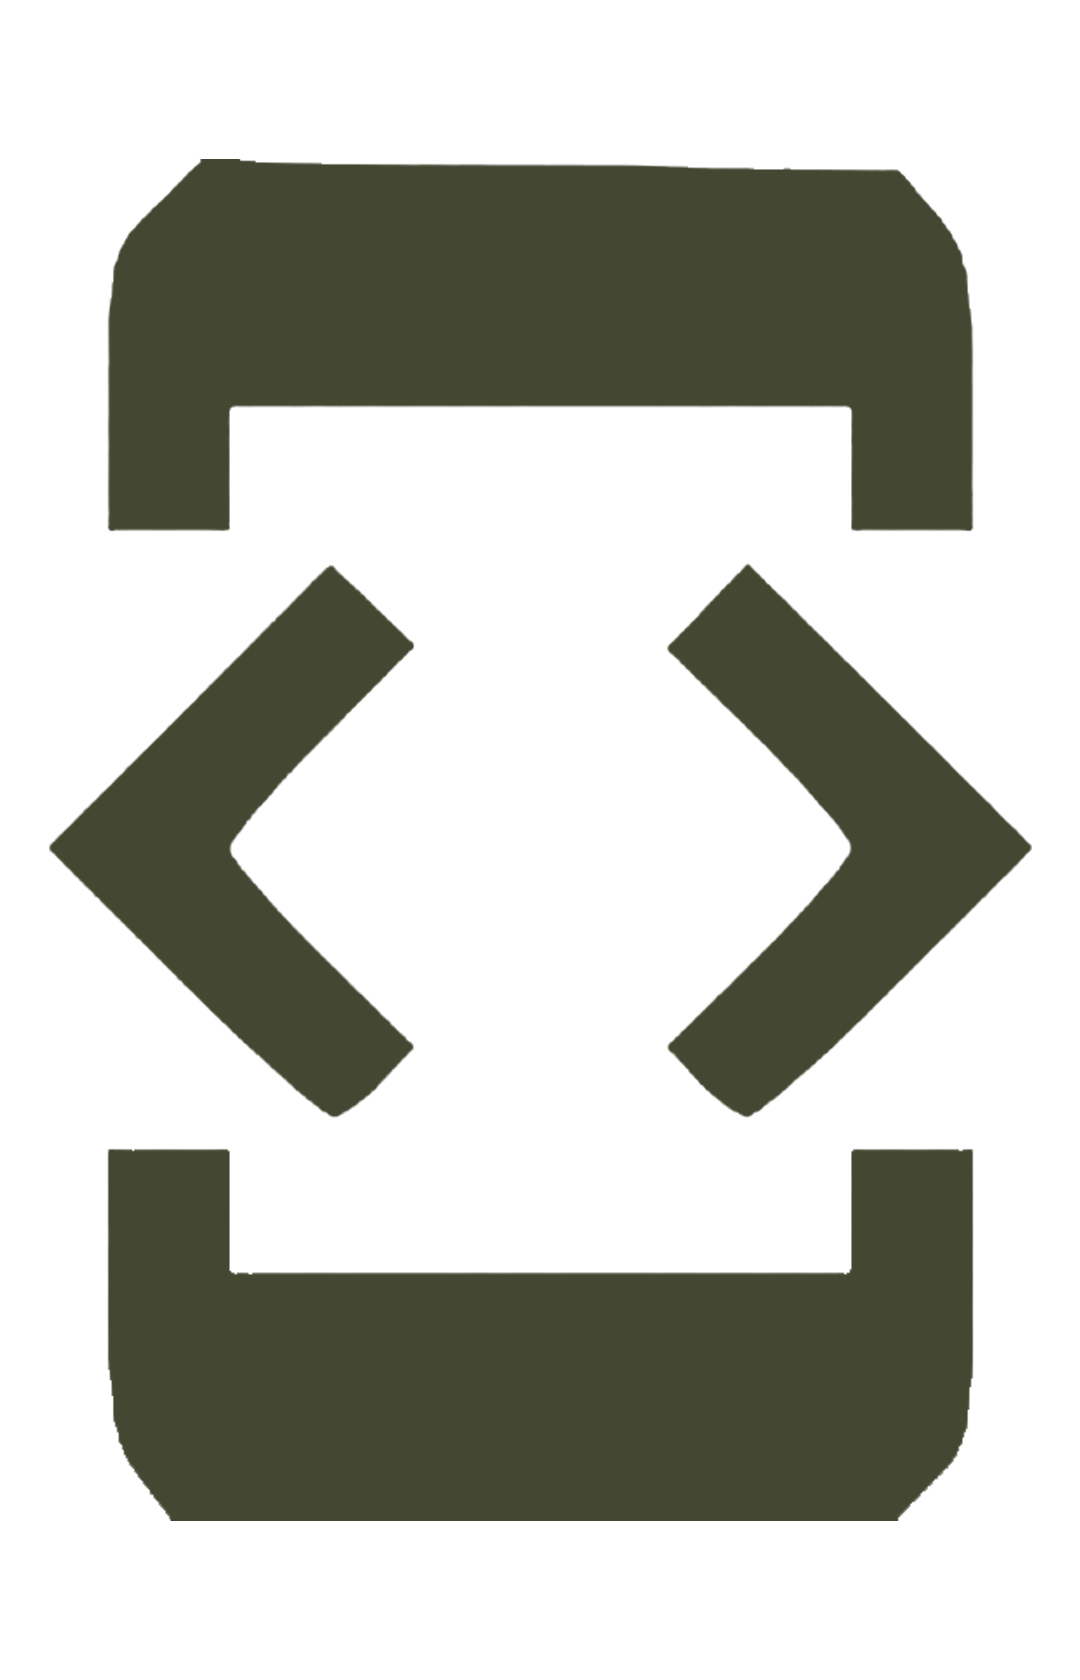 mobile-application-image-MCi